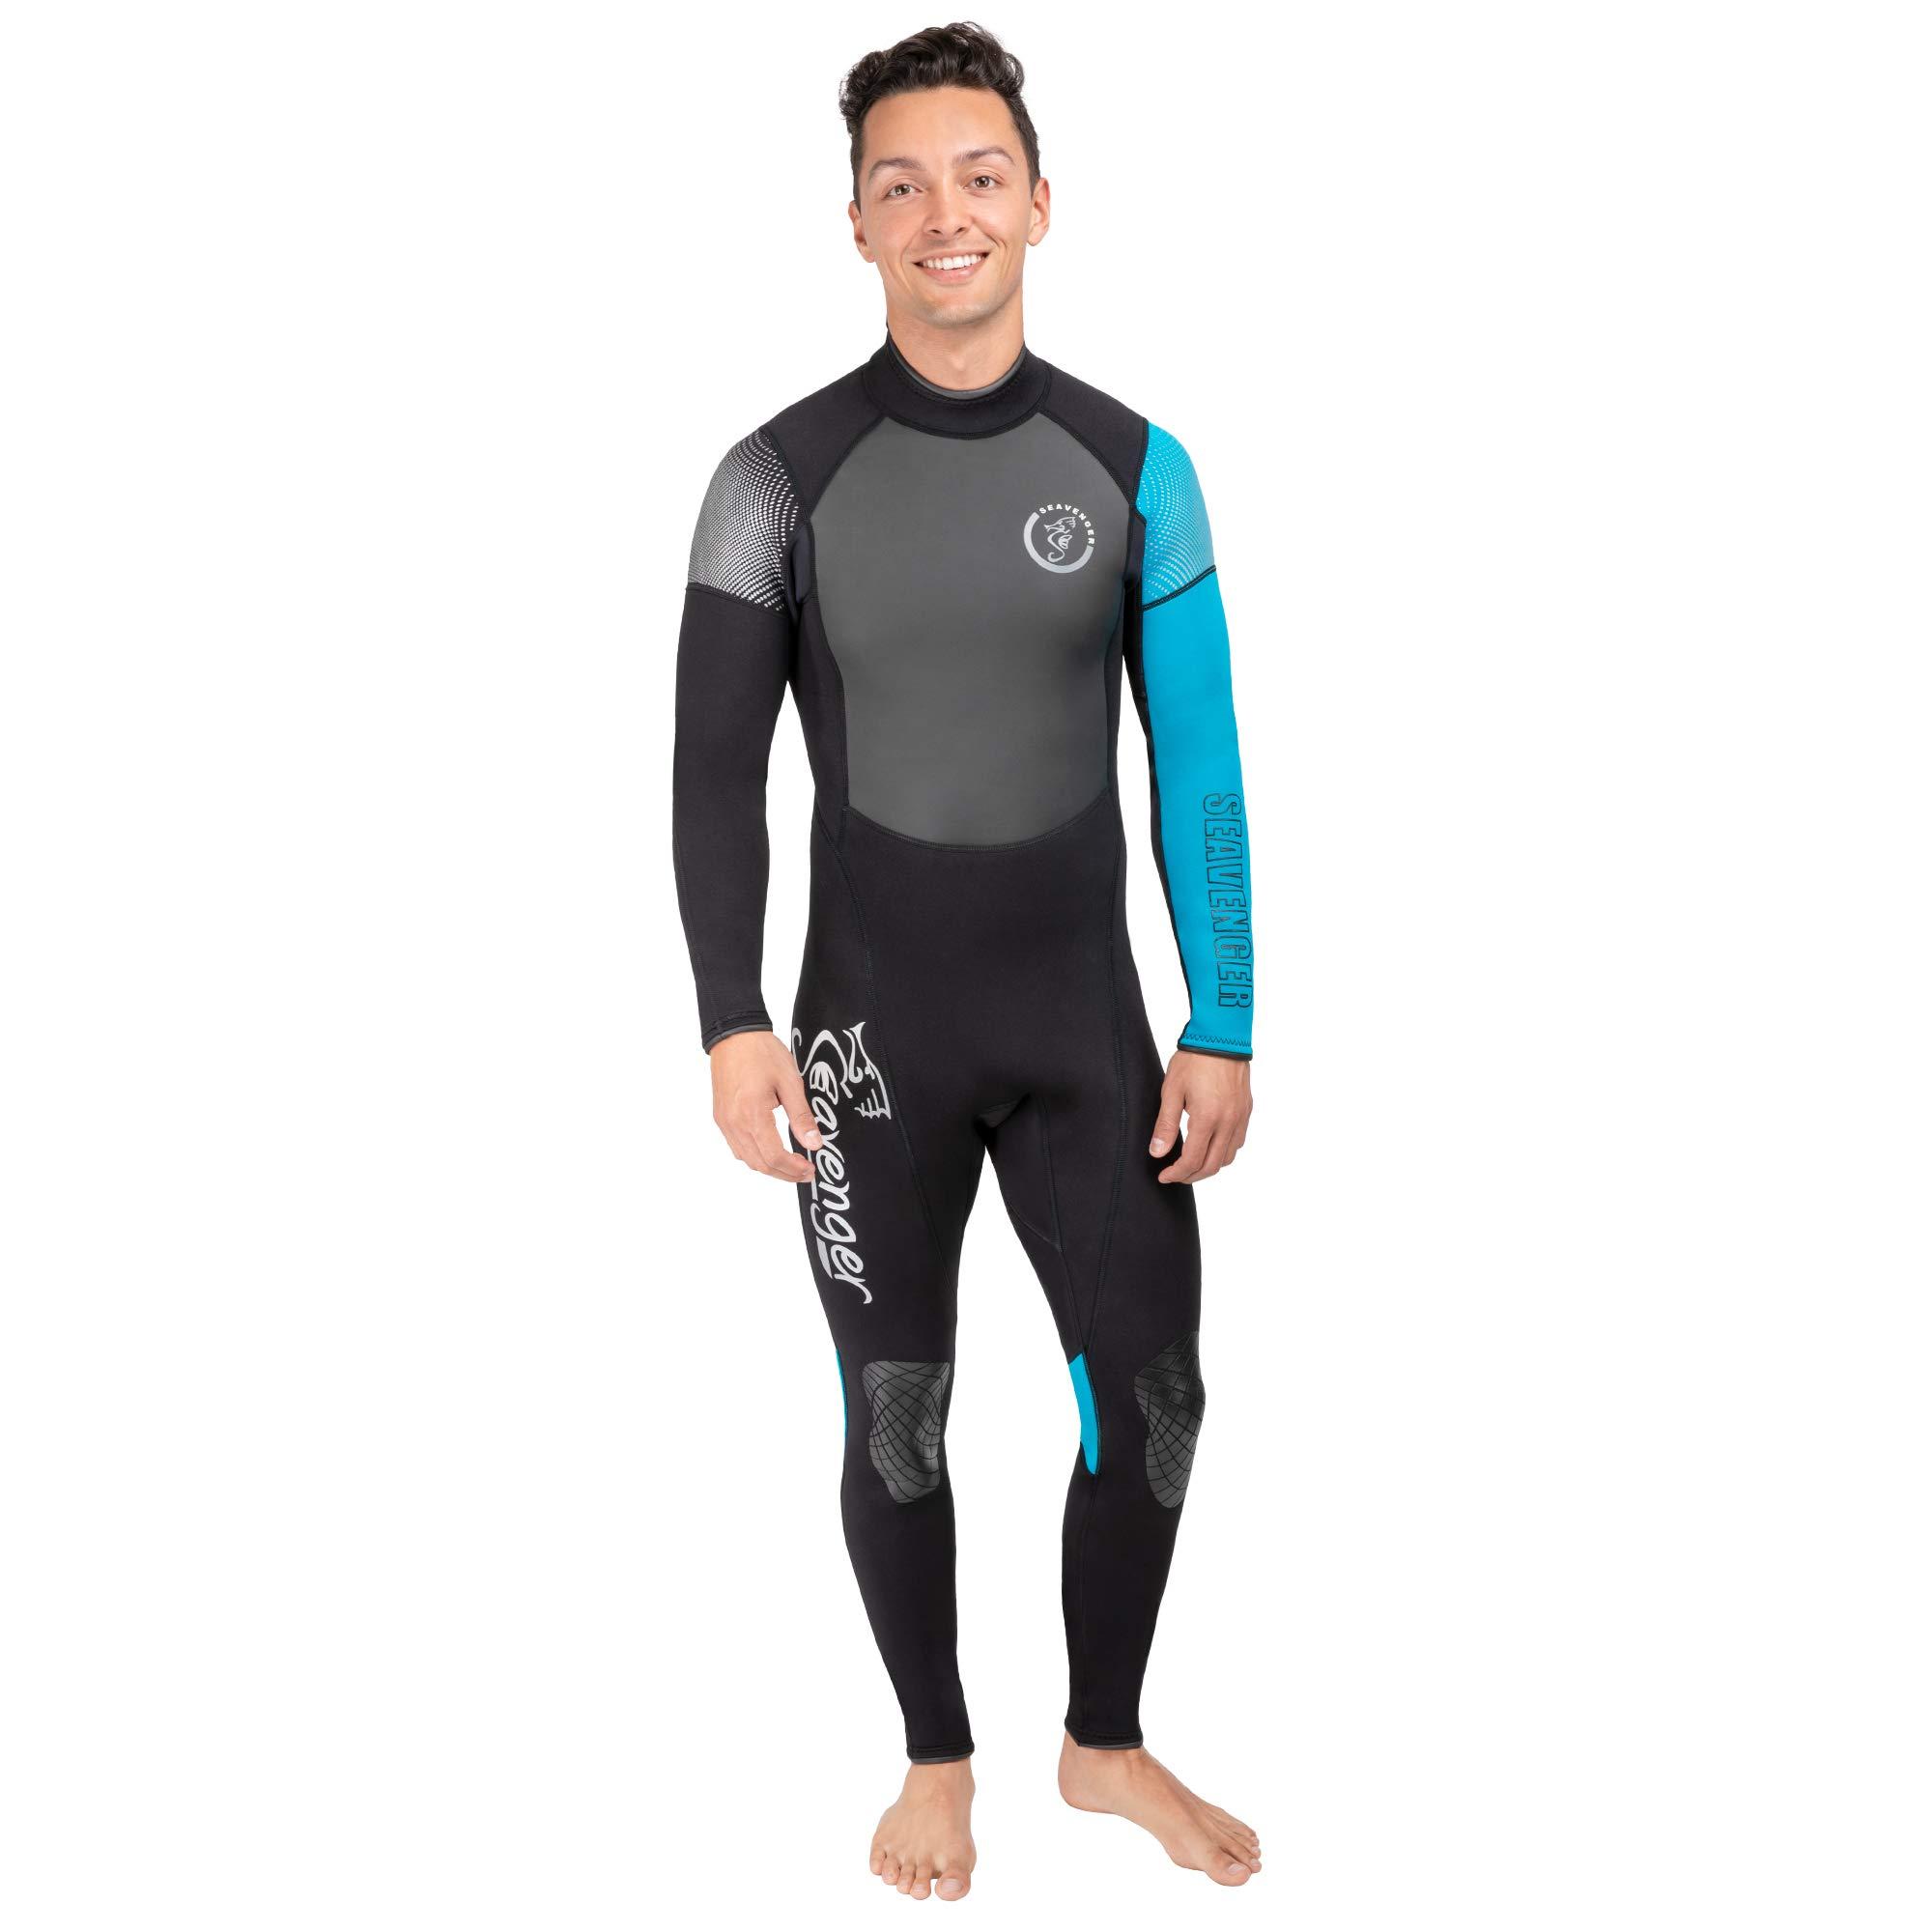 Seavenger 3mm Odyssey Wetsuit with Sharkskin Chest by Seavenger